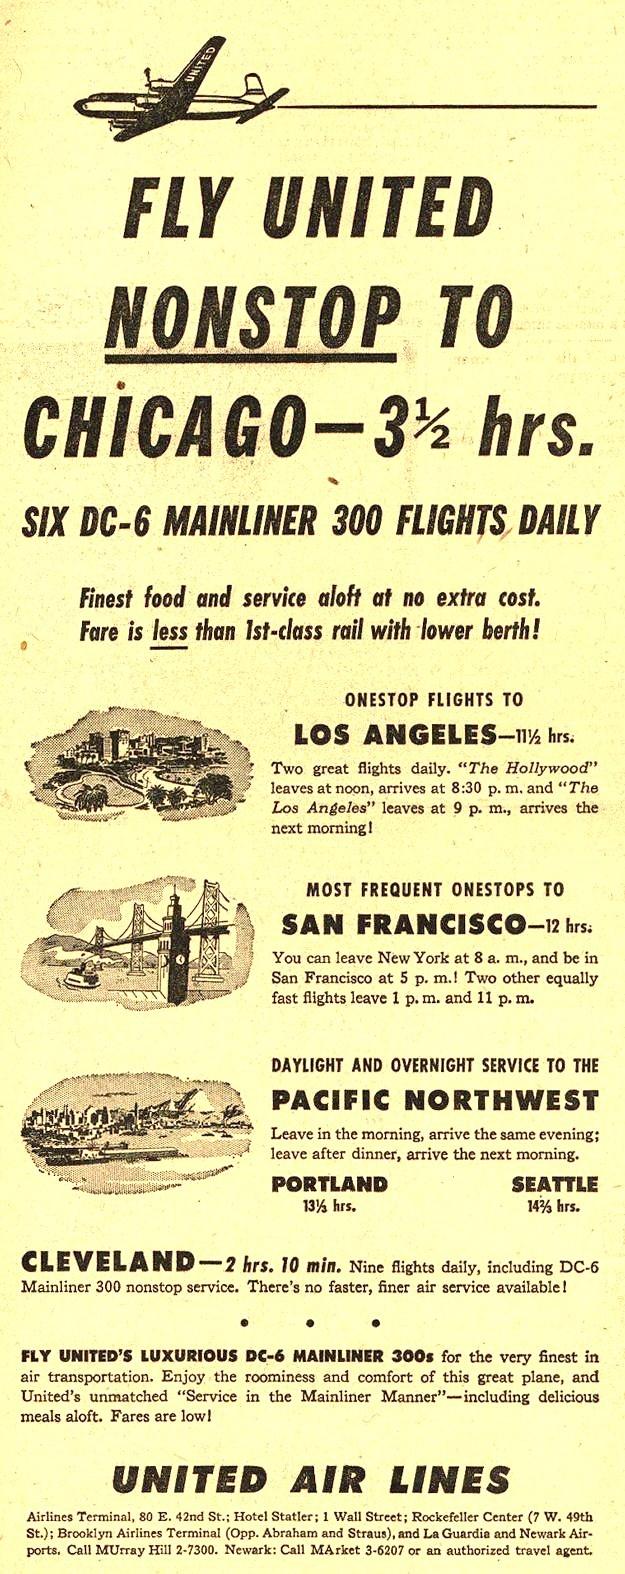 837 best PLANES/airlines images on Pinterest | Air travel, Vintage ...